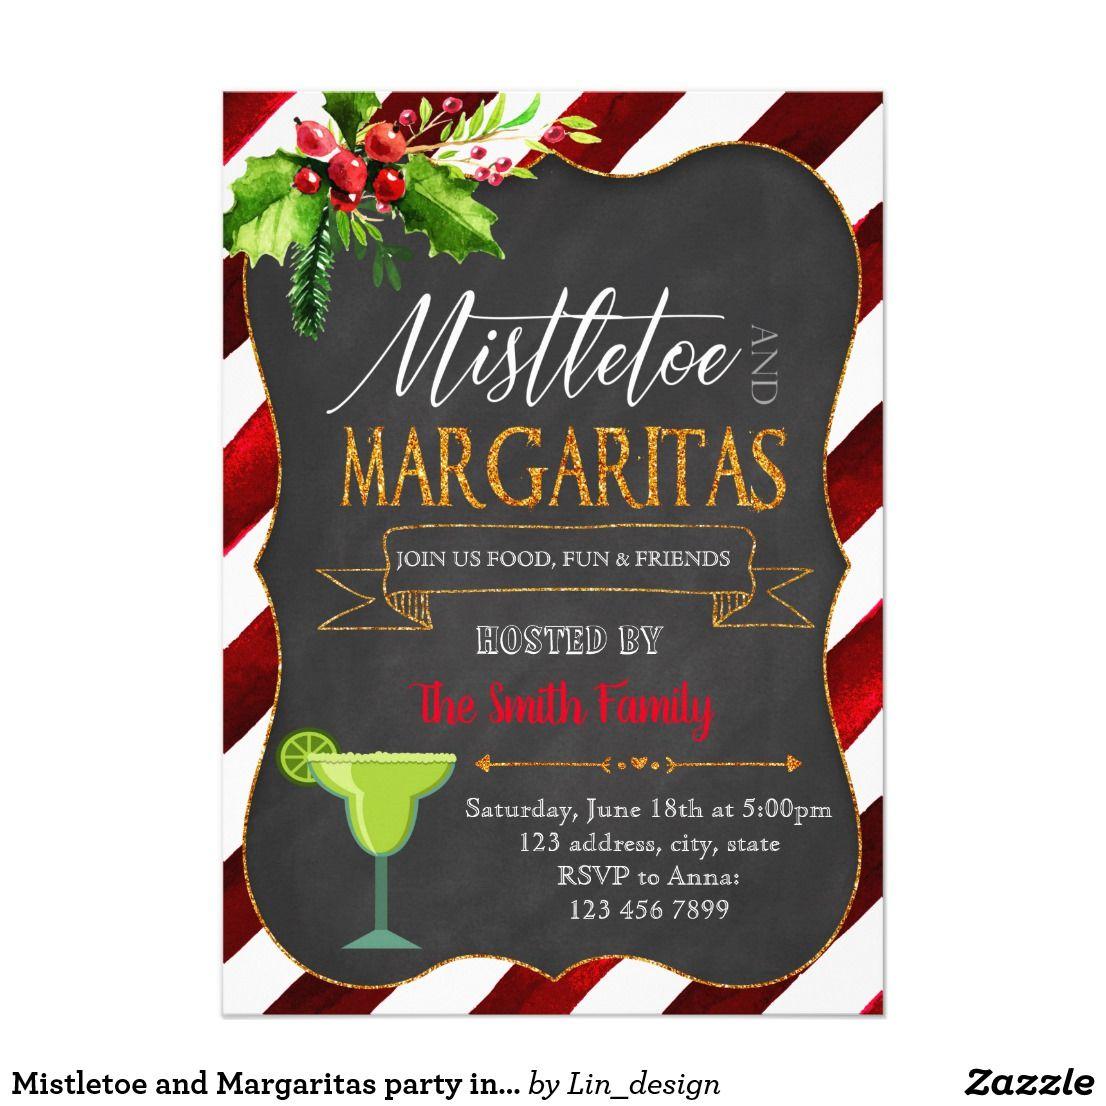 Mistletoe and Margaritas party invitation | Zazzle.com